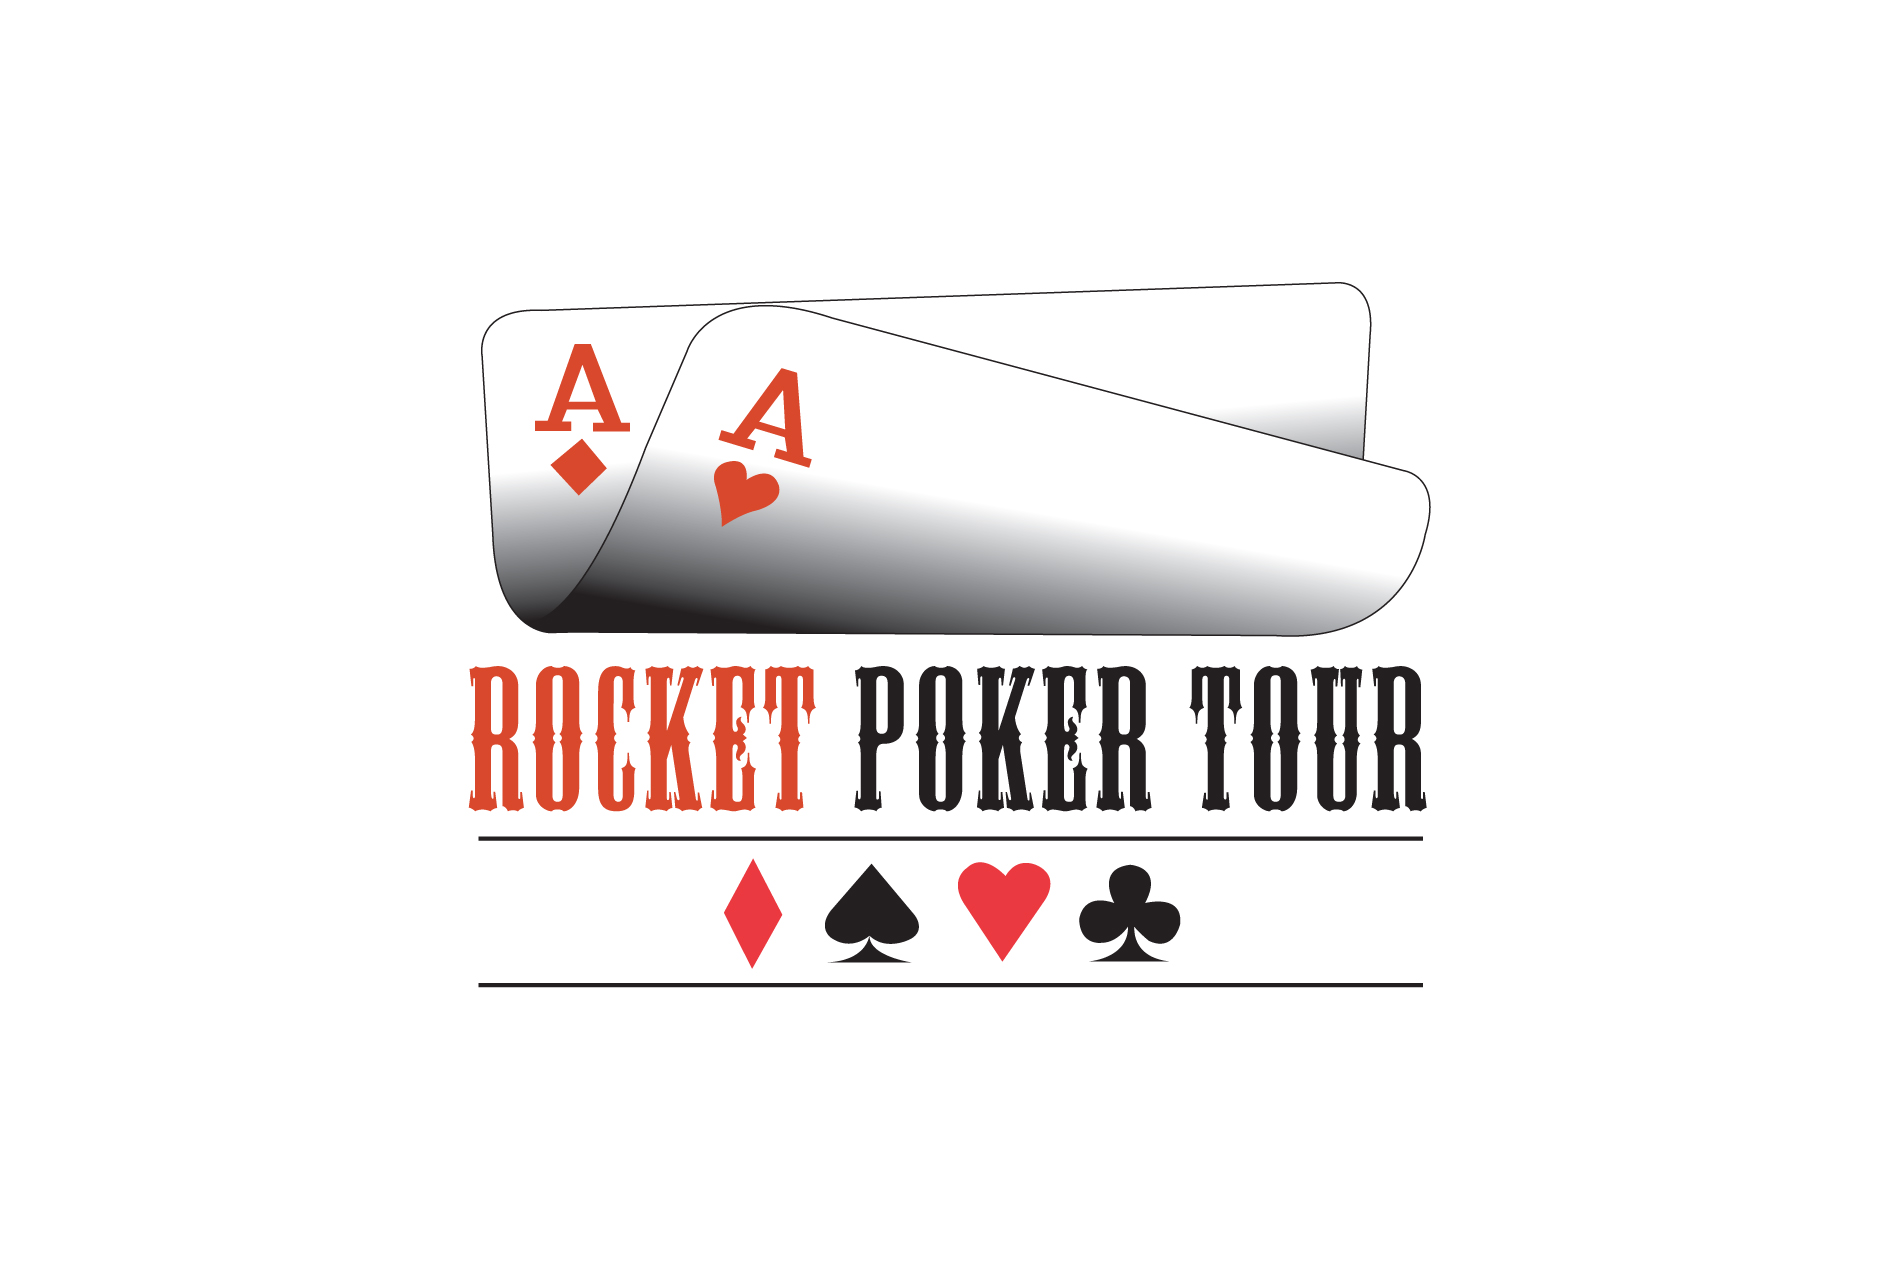 Rocket Poker Logo